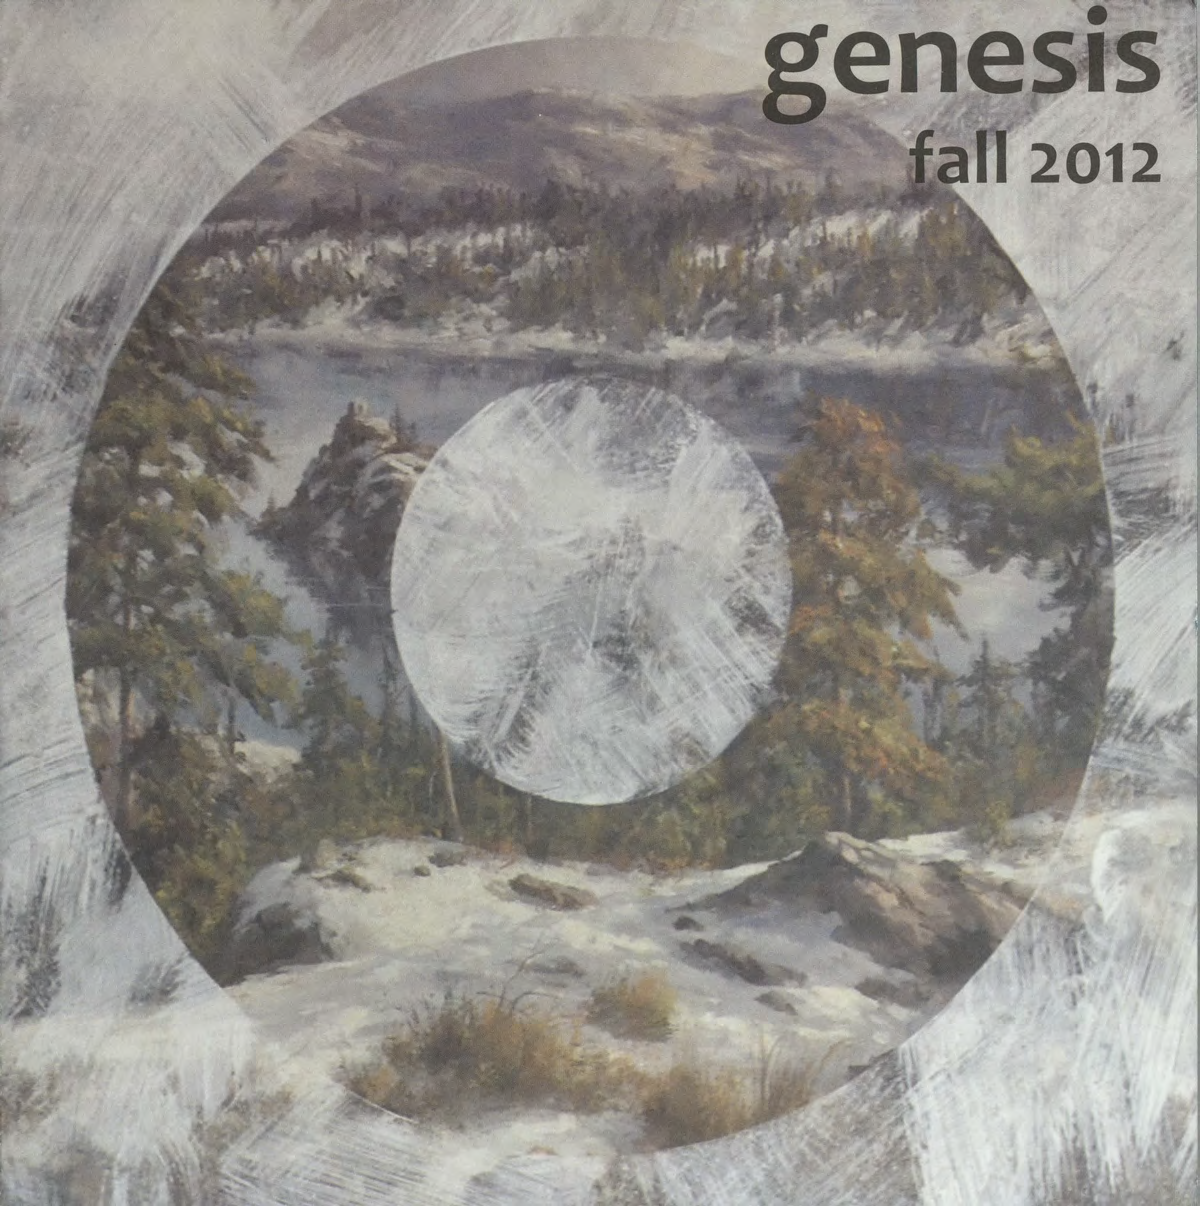 genesis fall 2012 cover